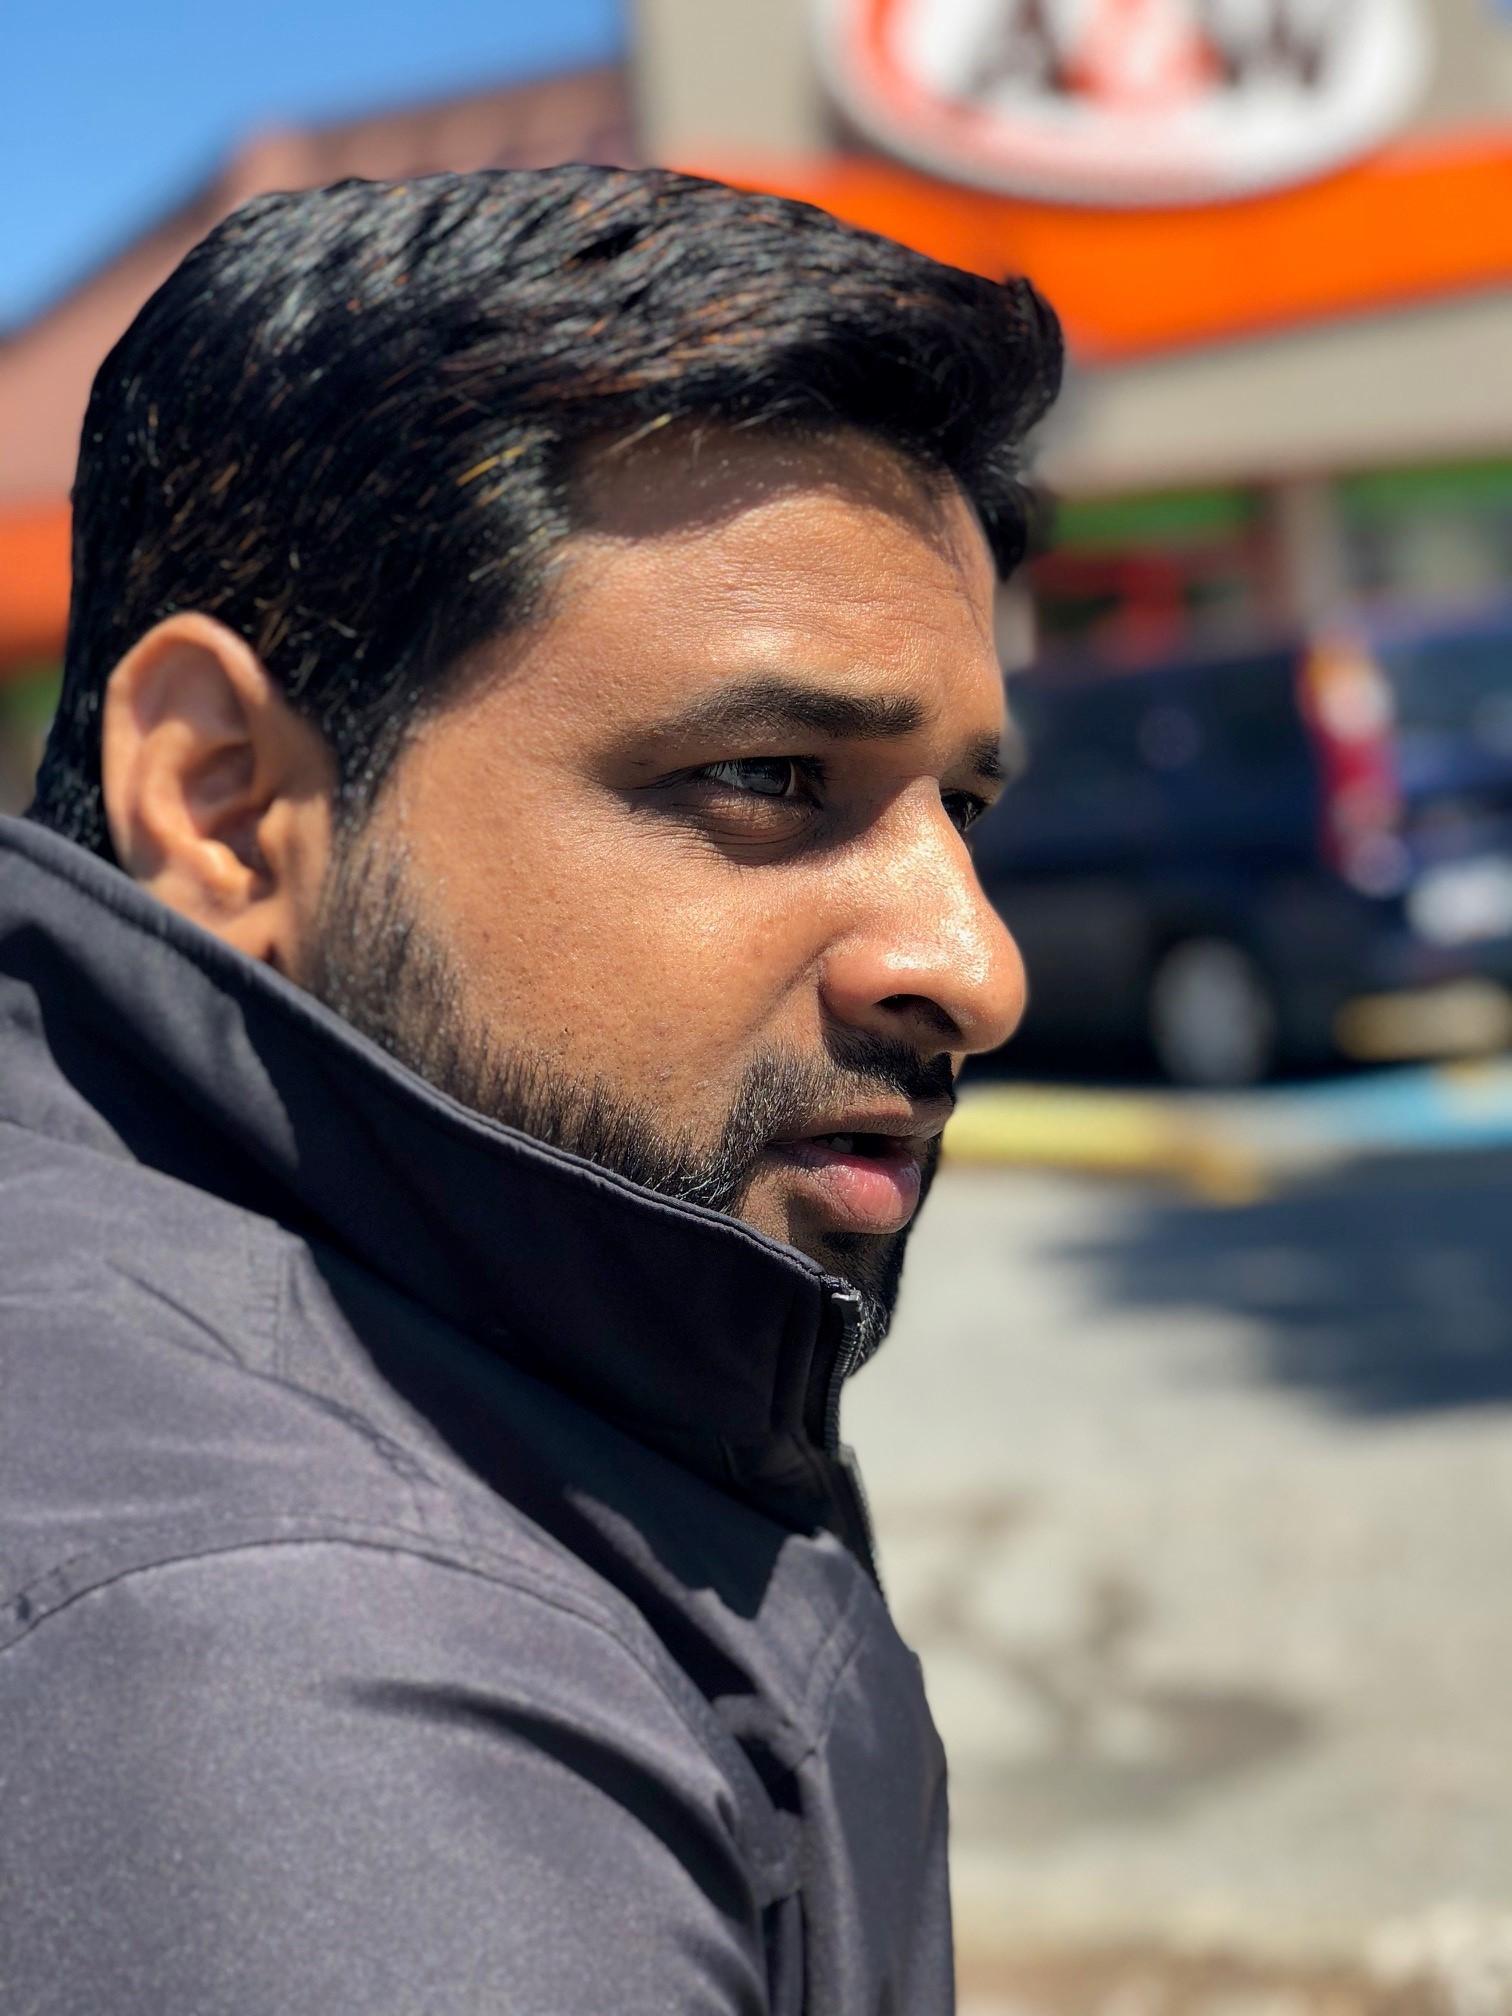 Yasir Arfath